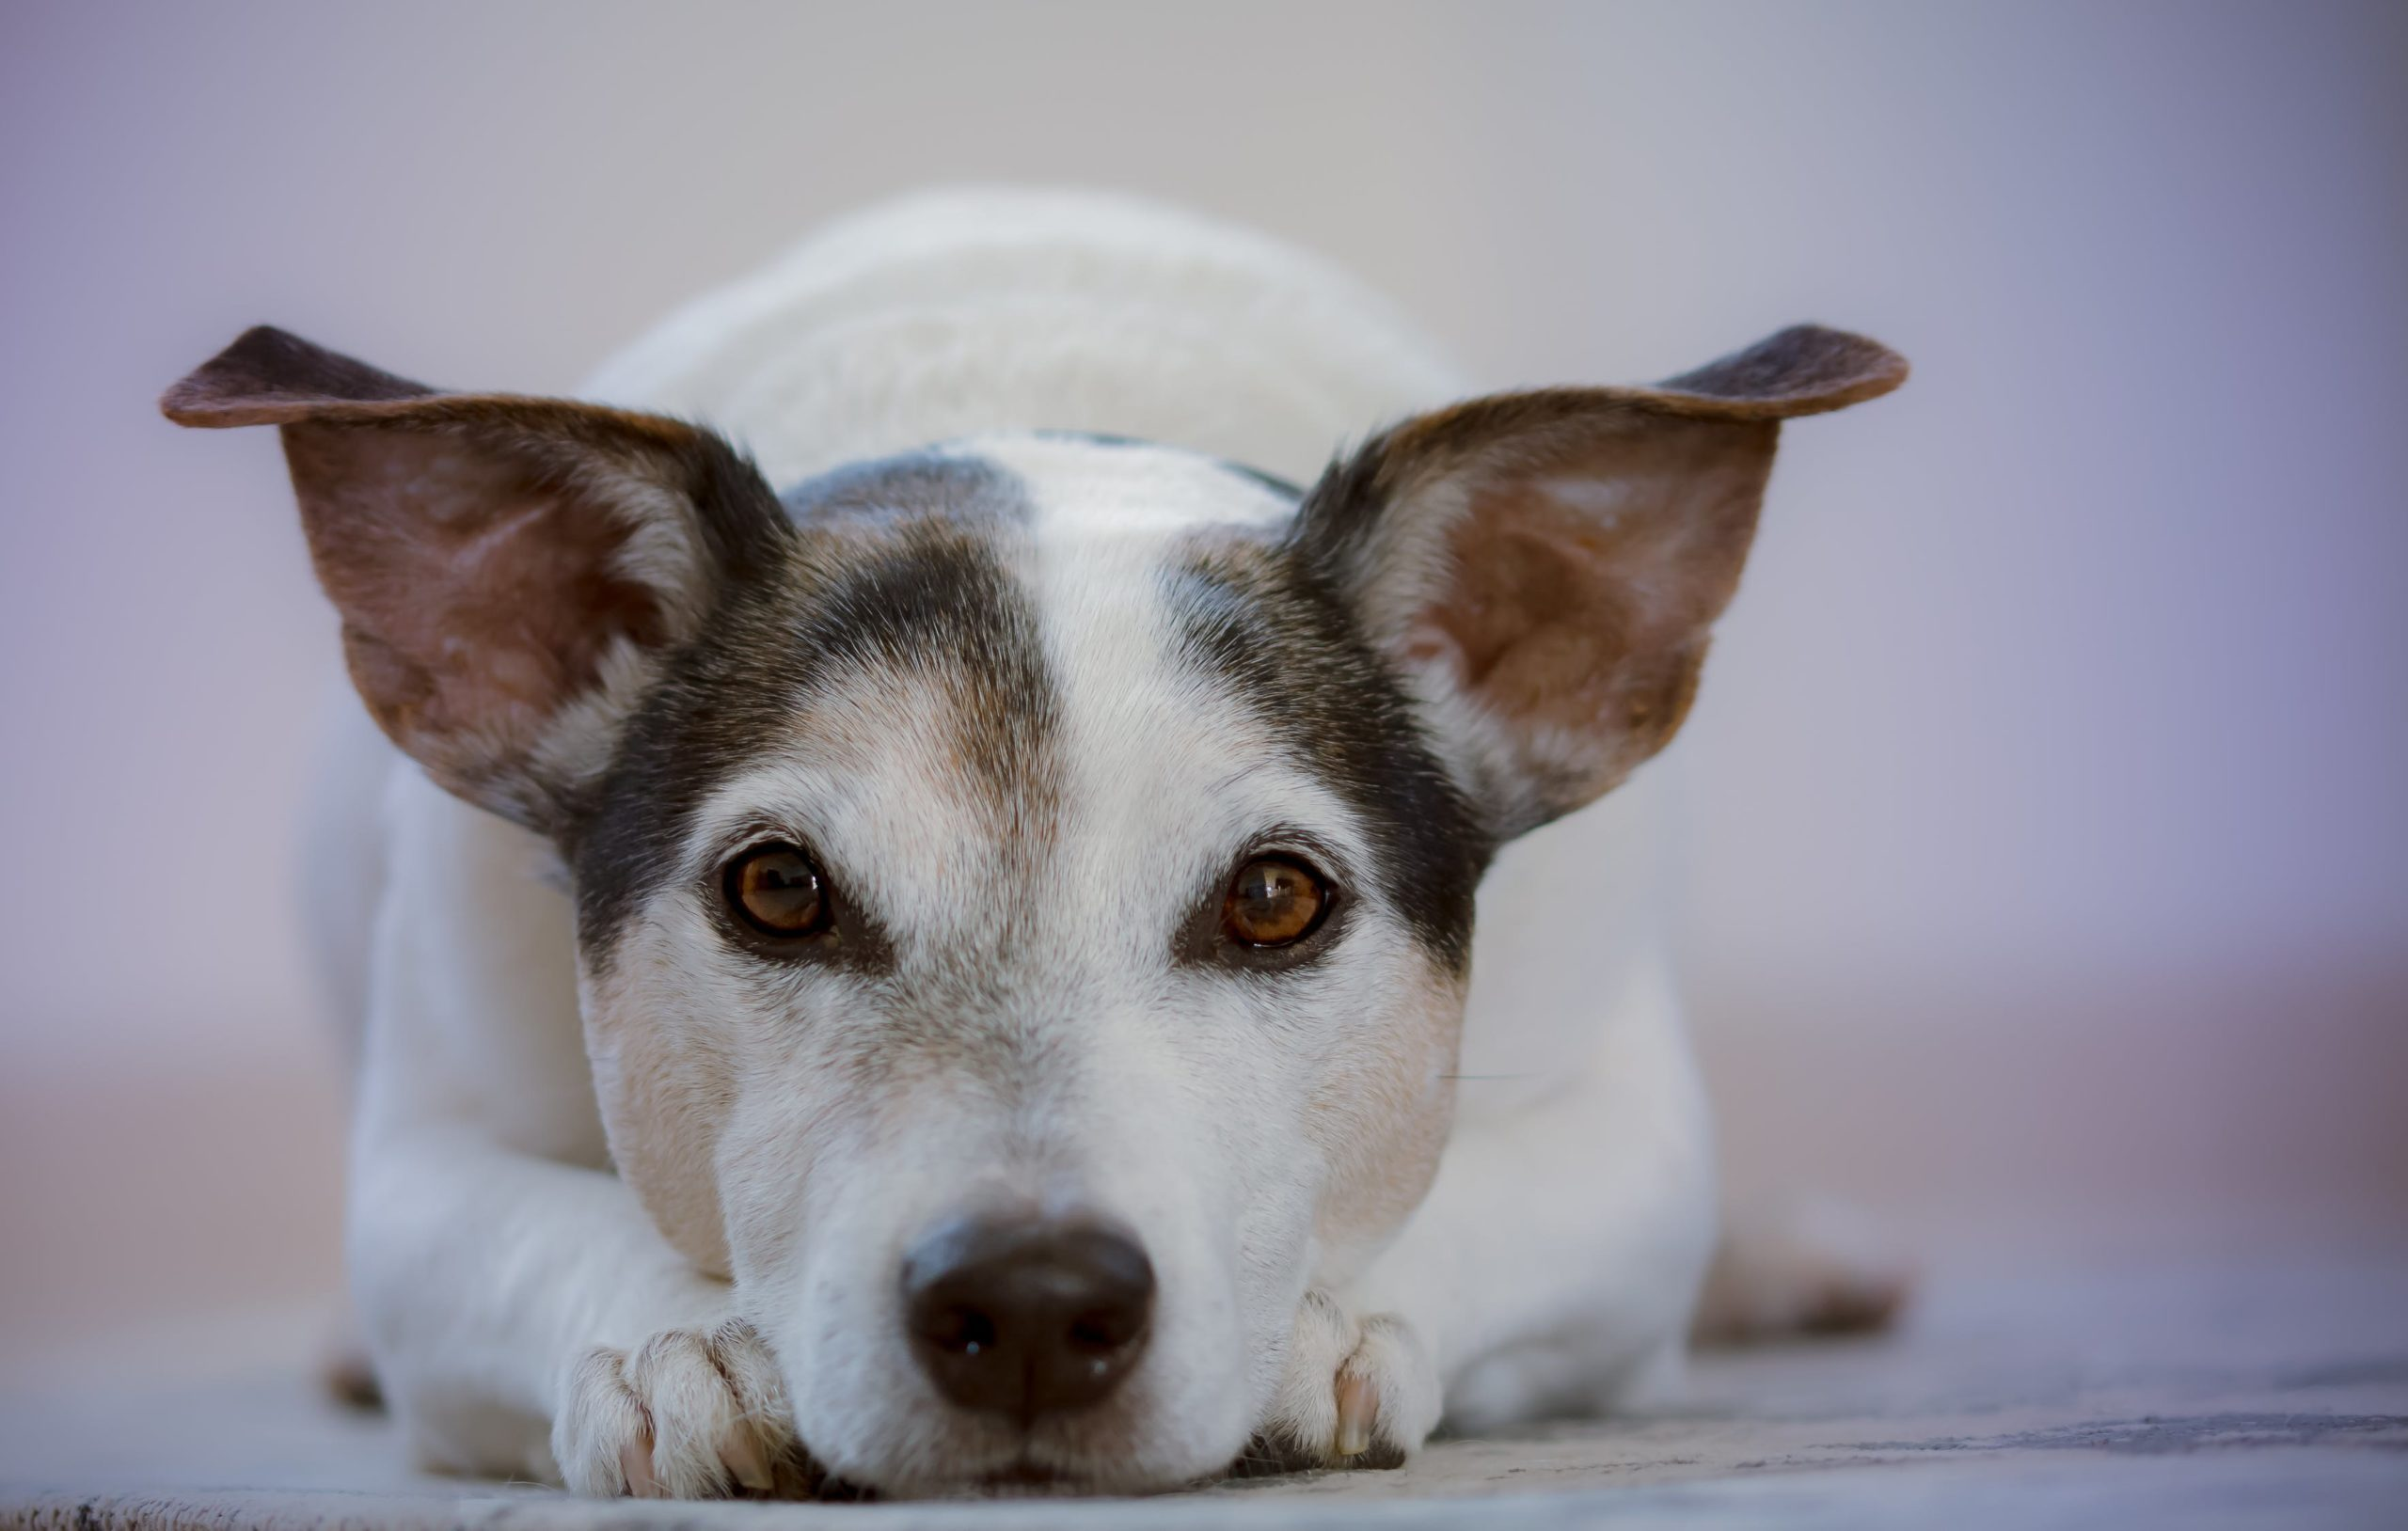 Coronavirus in Dogs: Can Dogs Get Coronavirus?